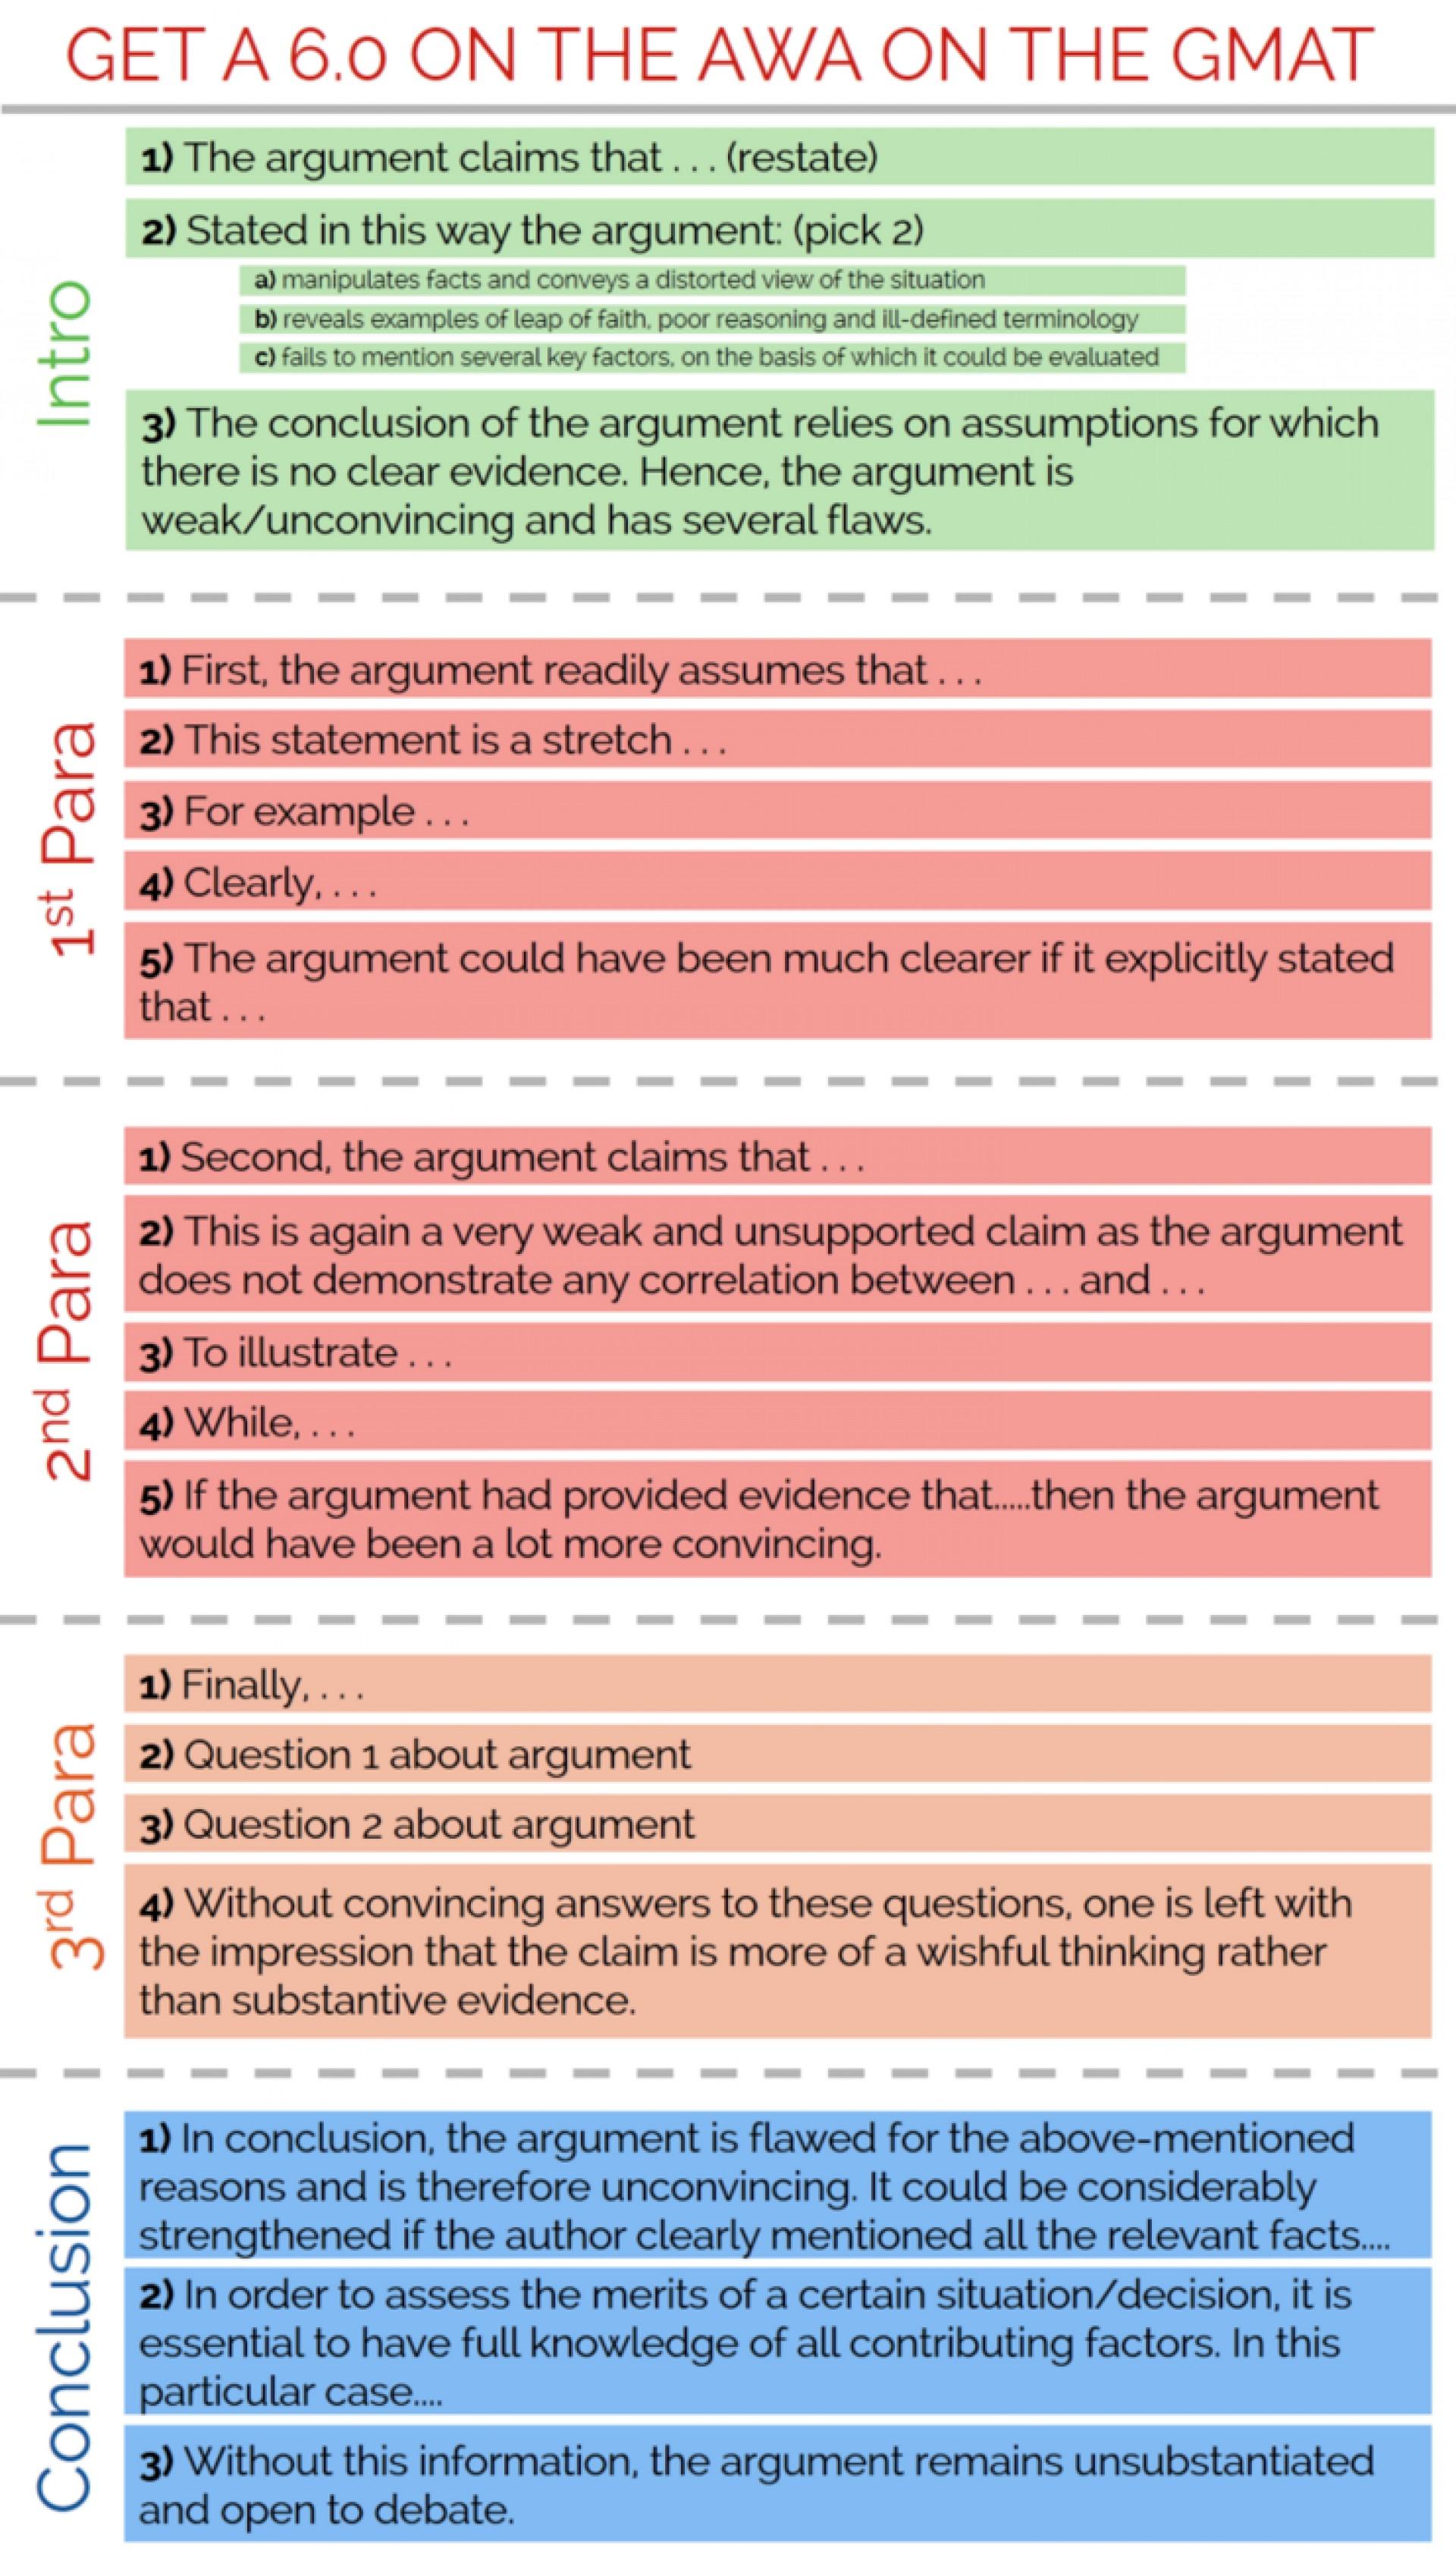 019 Gre Argument Essay Template Gdxgsga1 Frightening Example 1920